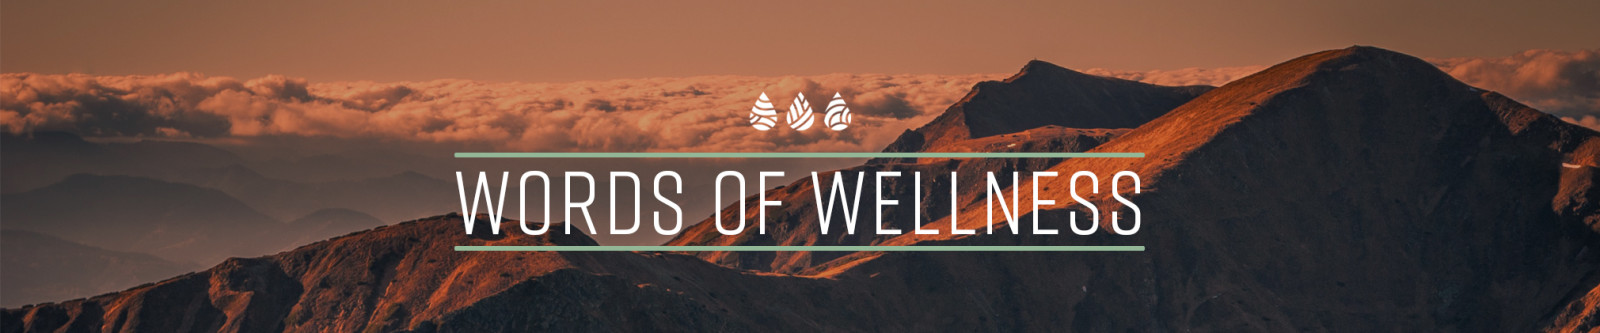 words of wellness words over nature landscape